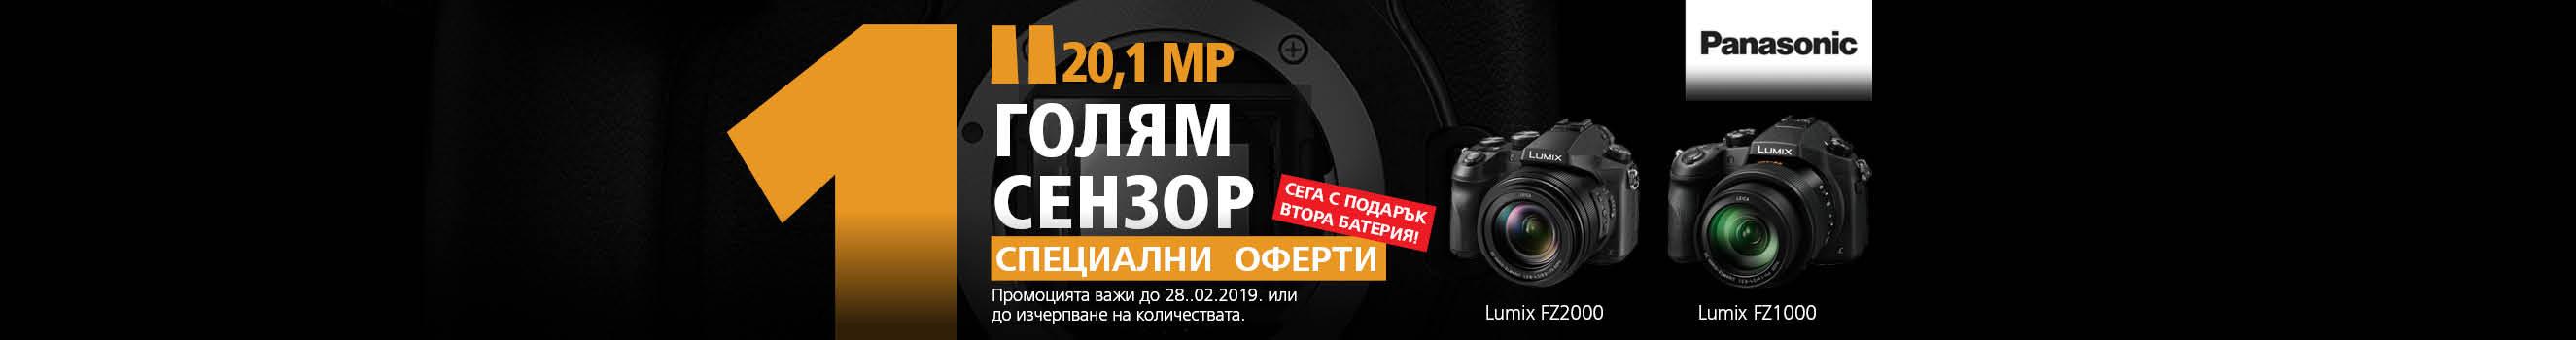 Фотоапарати Panasonic FZ1000 и FZ2000 с подарък батерия и супер цена